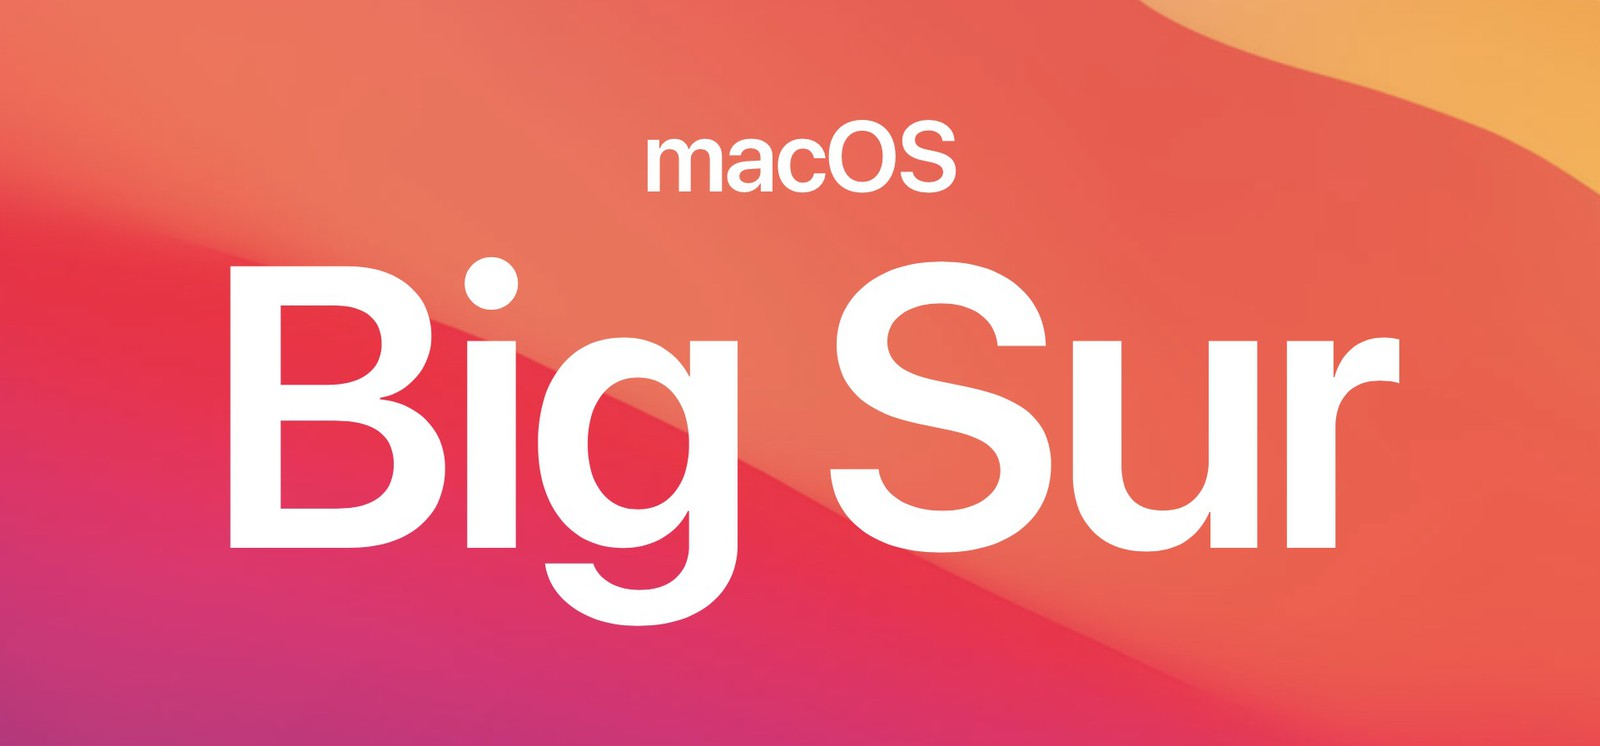 macOS Big Sur bude k dispozici 12. listopadu